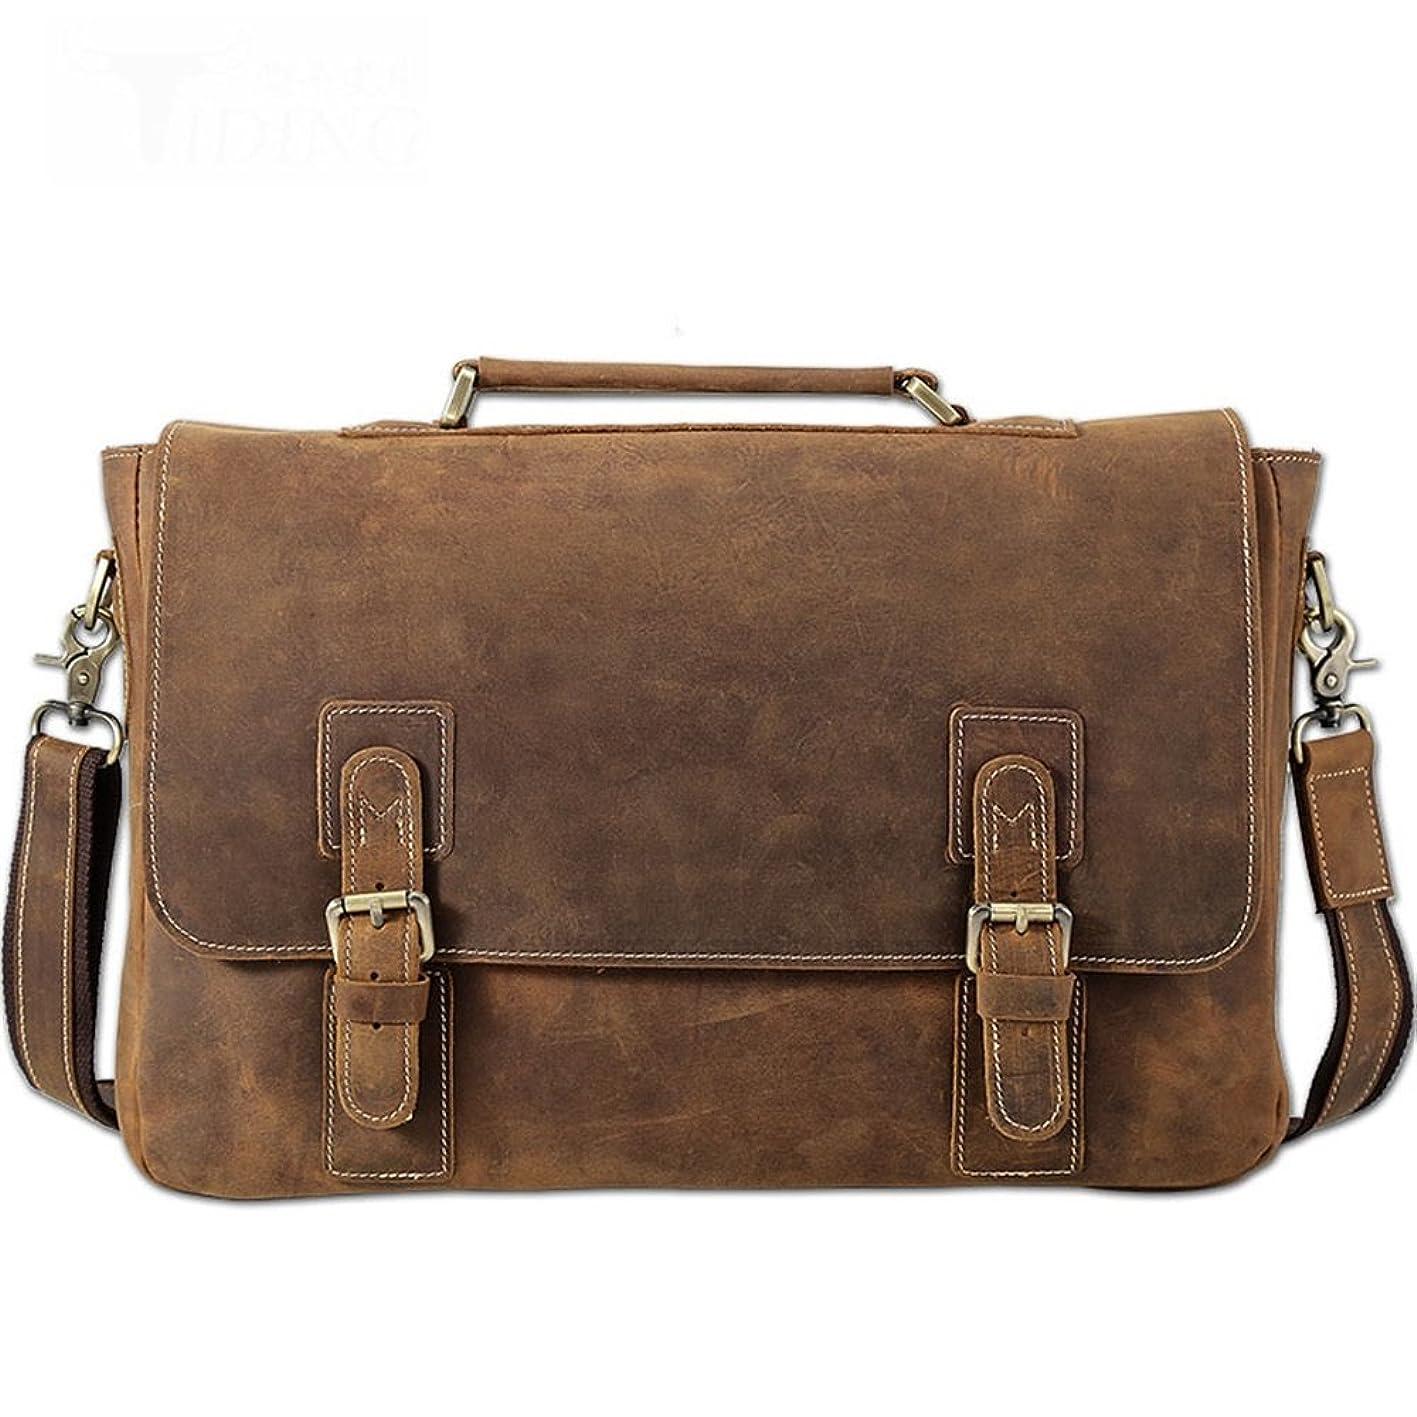 Softgo briefcases Men's Briefcase 14